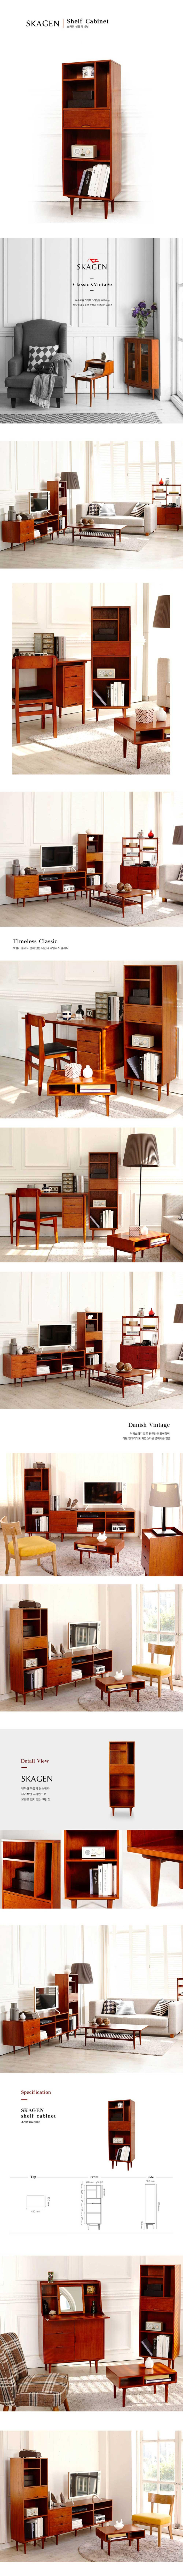 Skagen Danish Slim & Tall Shelf Cabinet